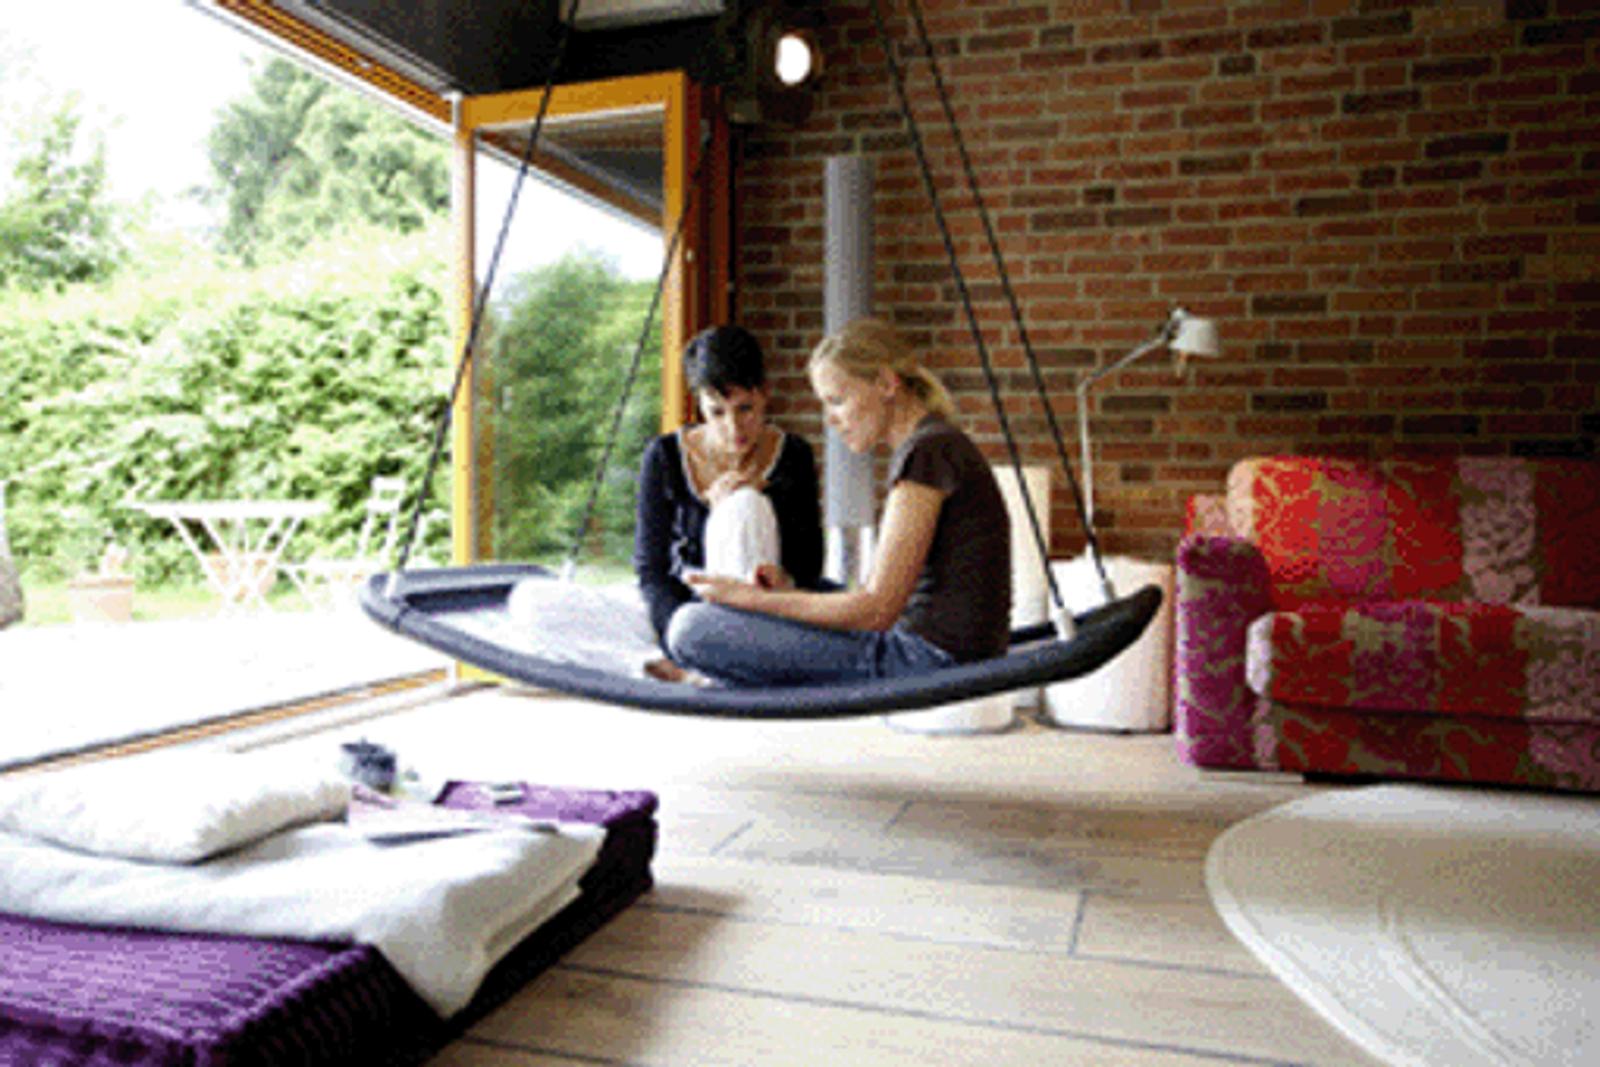 relax schaukel lifestyle plus xl extra lang extra breit farbe wei schwarz im haus an. Black Bedroom Furniture Sets. Home Design Ideas